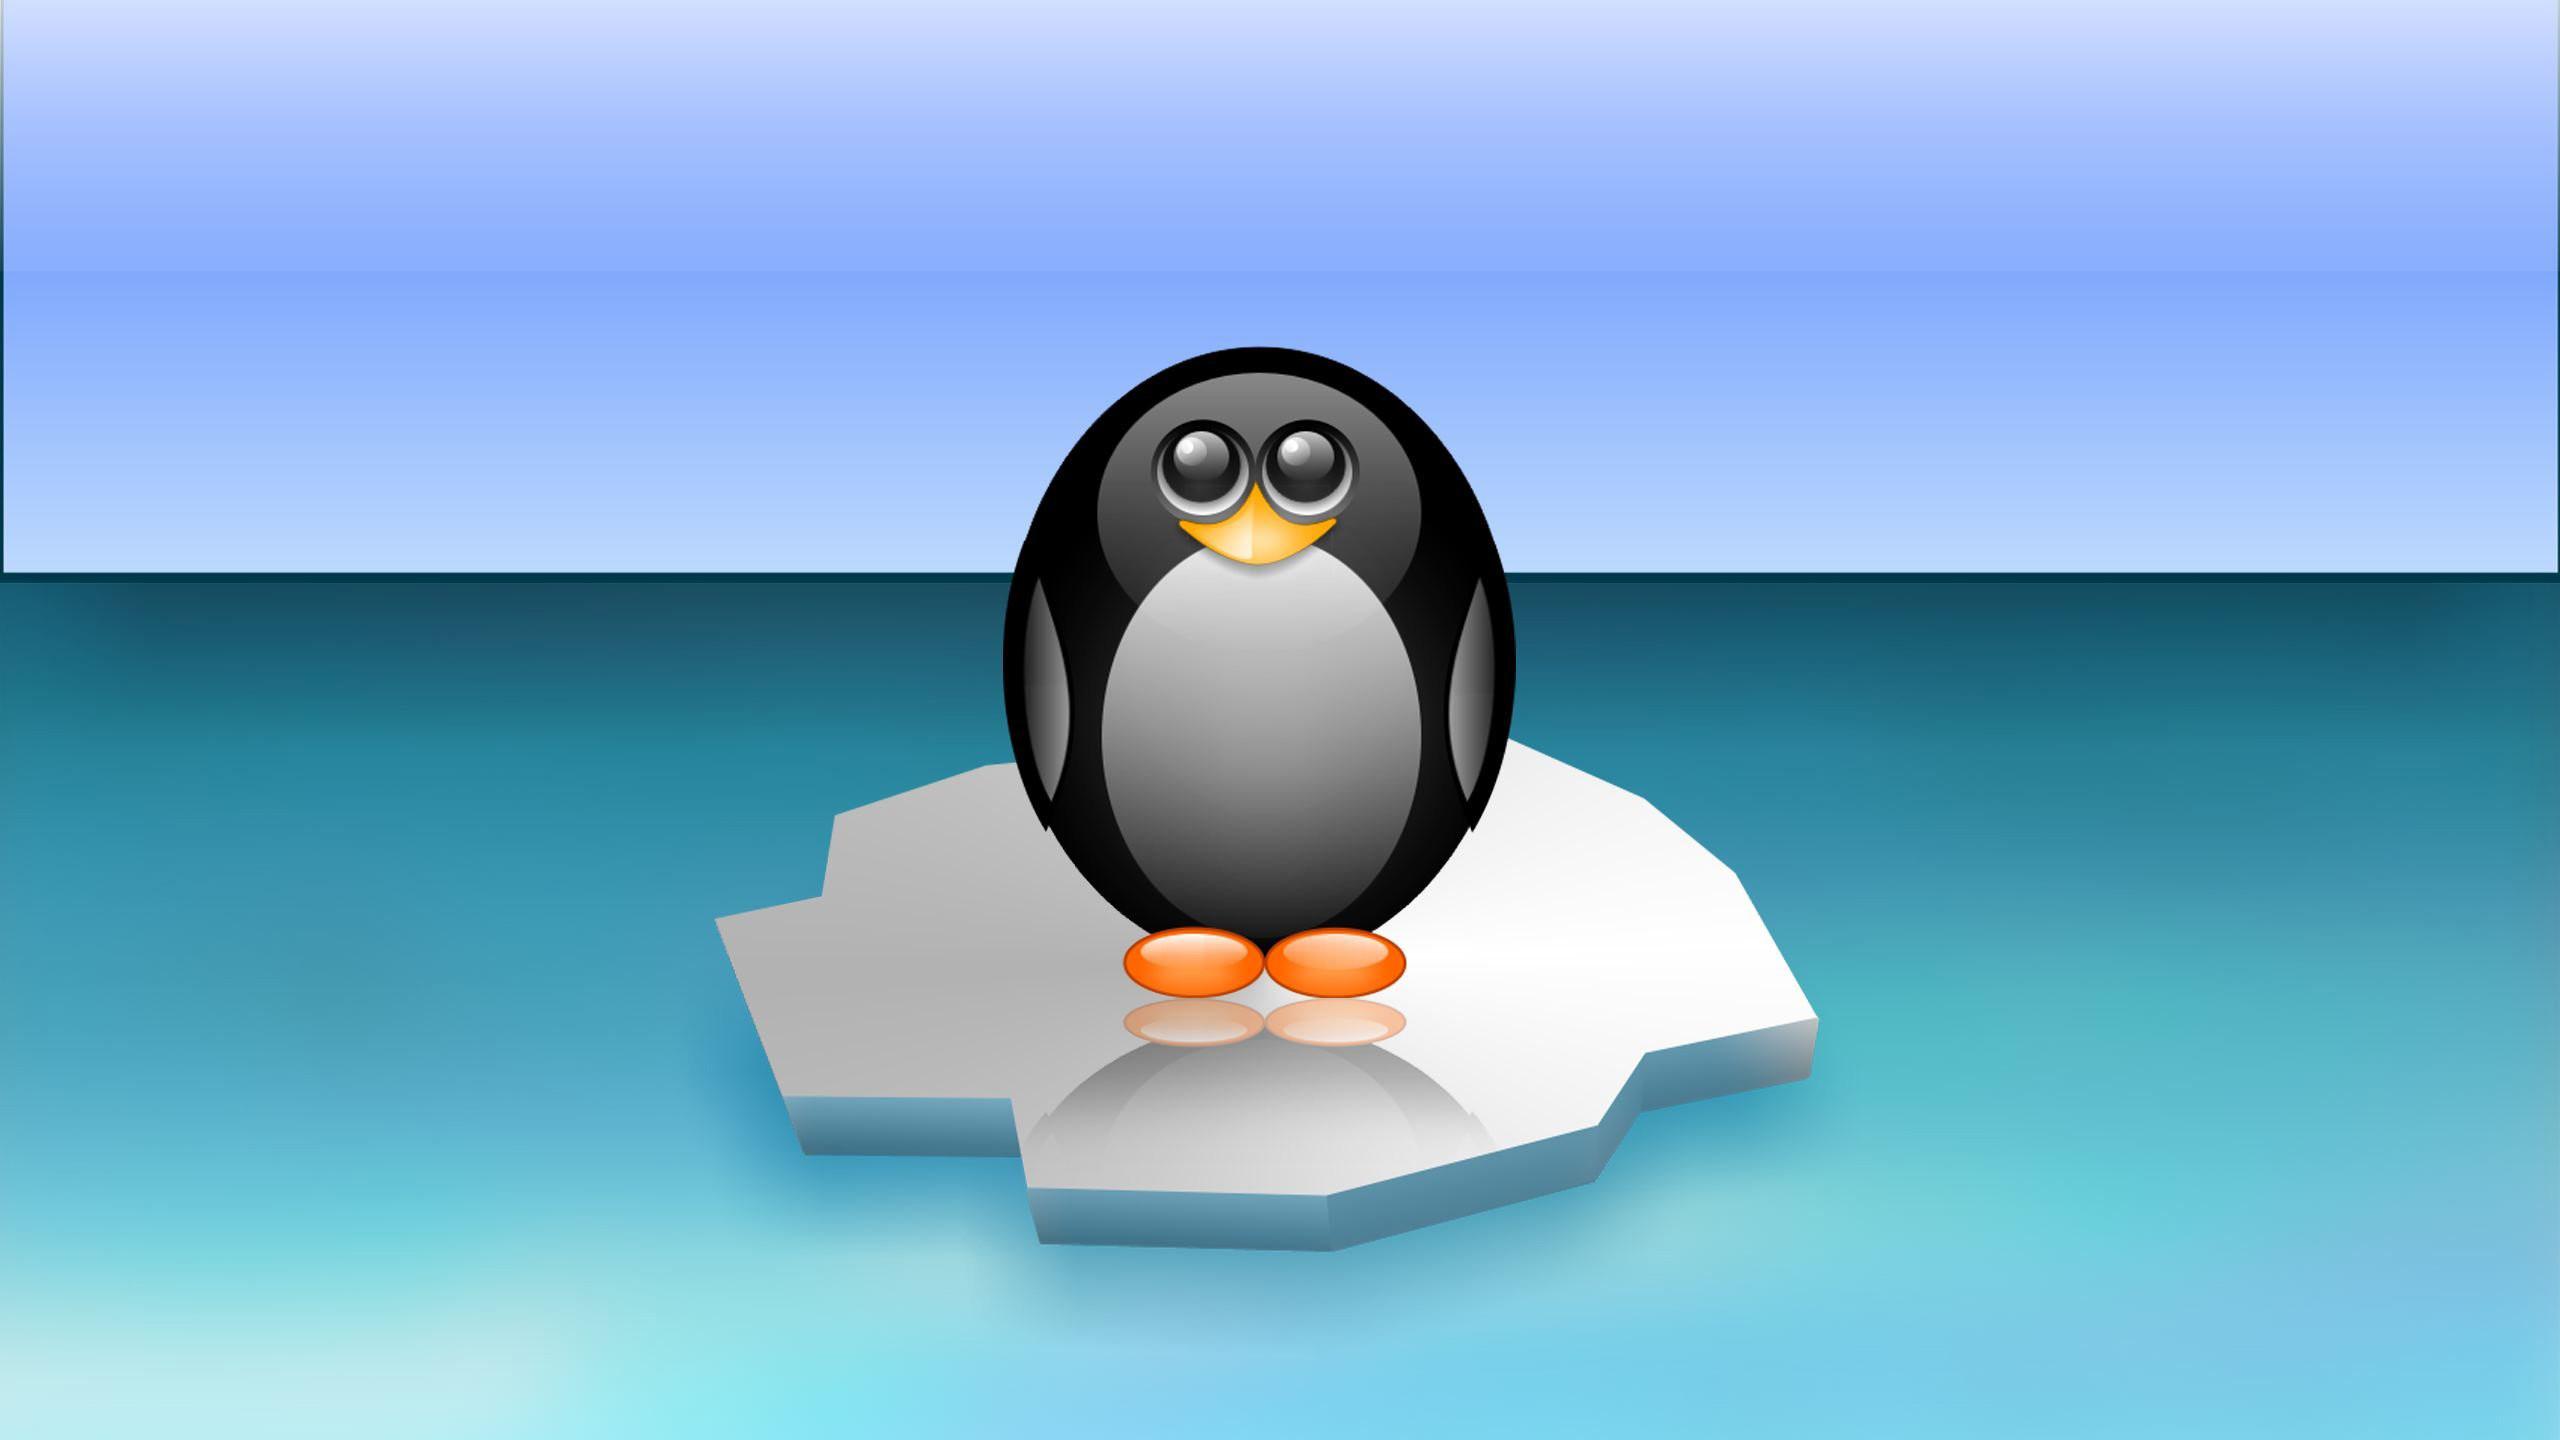 Linux Mint Animated Wallpaper Linux Tux Wallpaper 59 Images